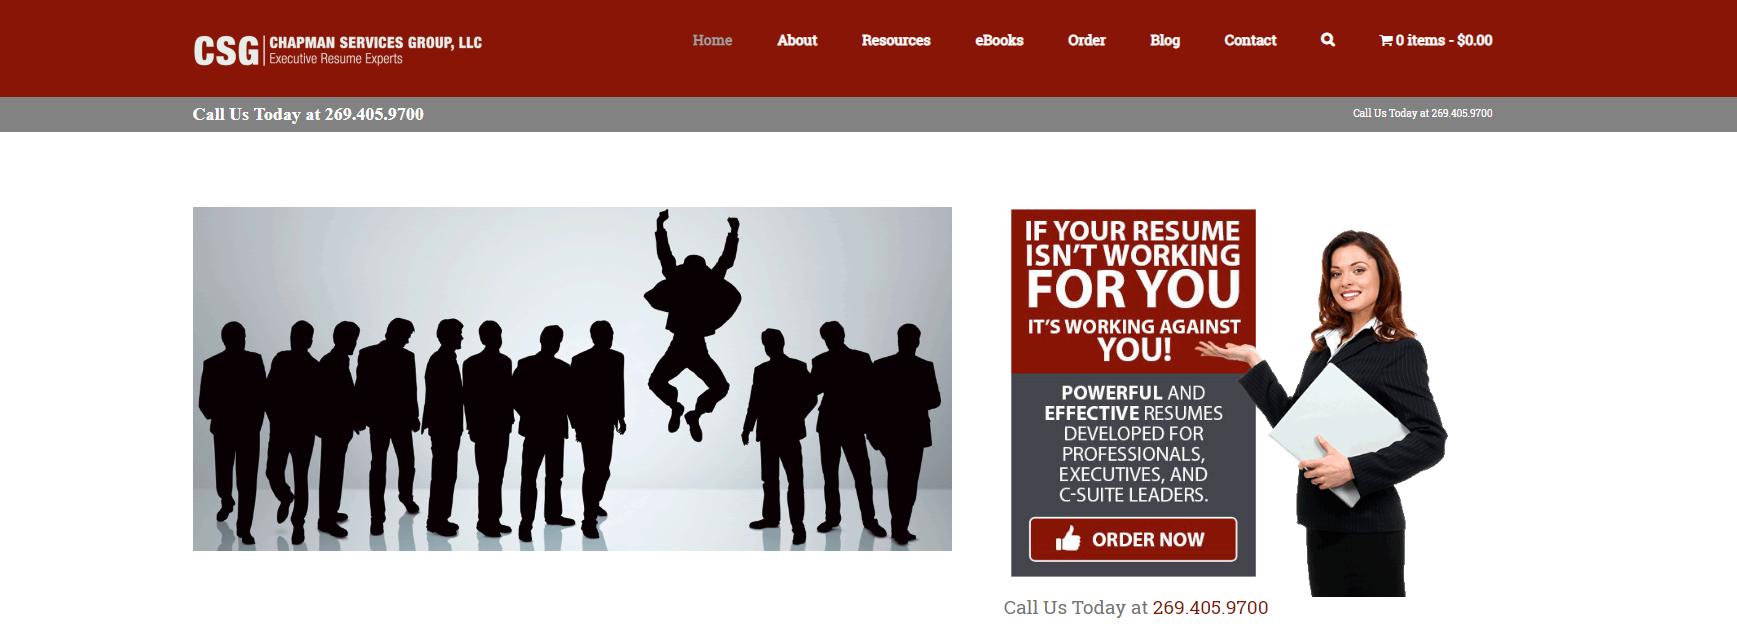 10 Best Resume Writers — screenshot of Chapman Services' homepage